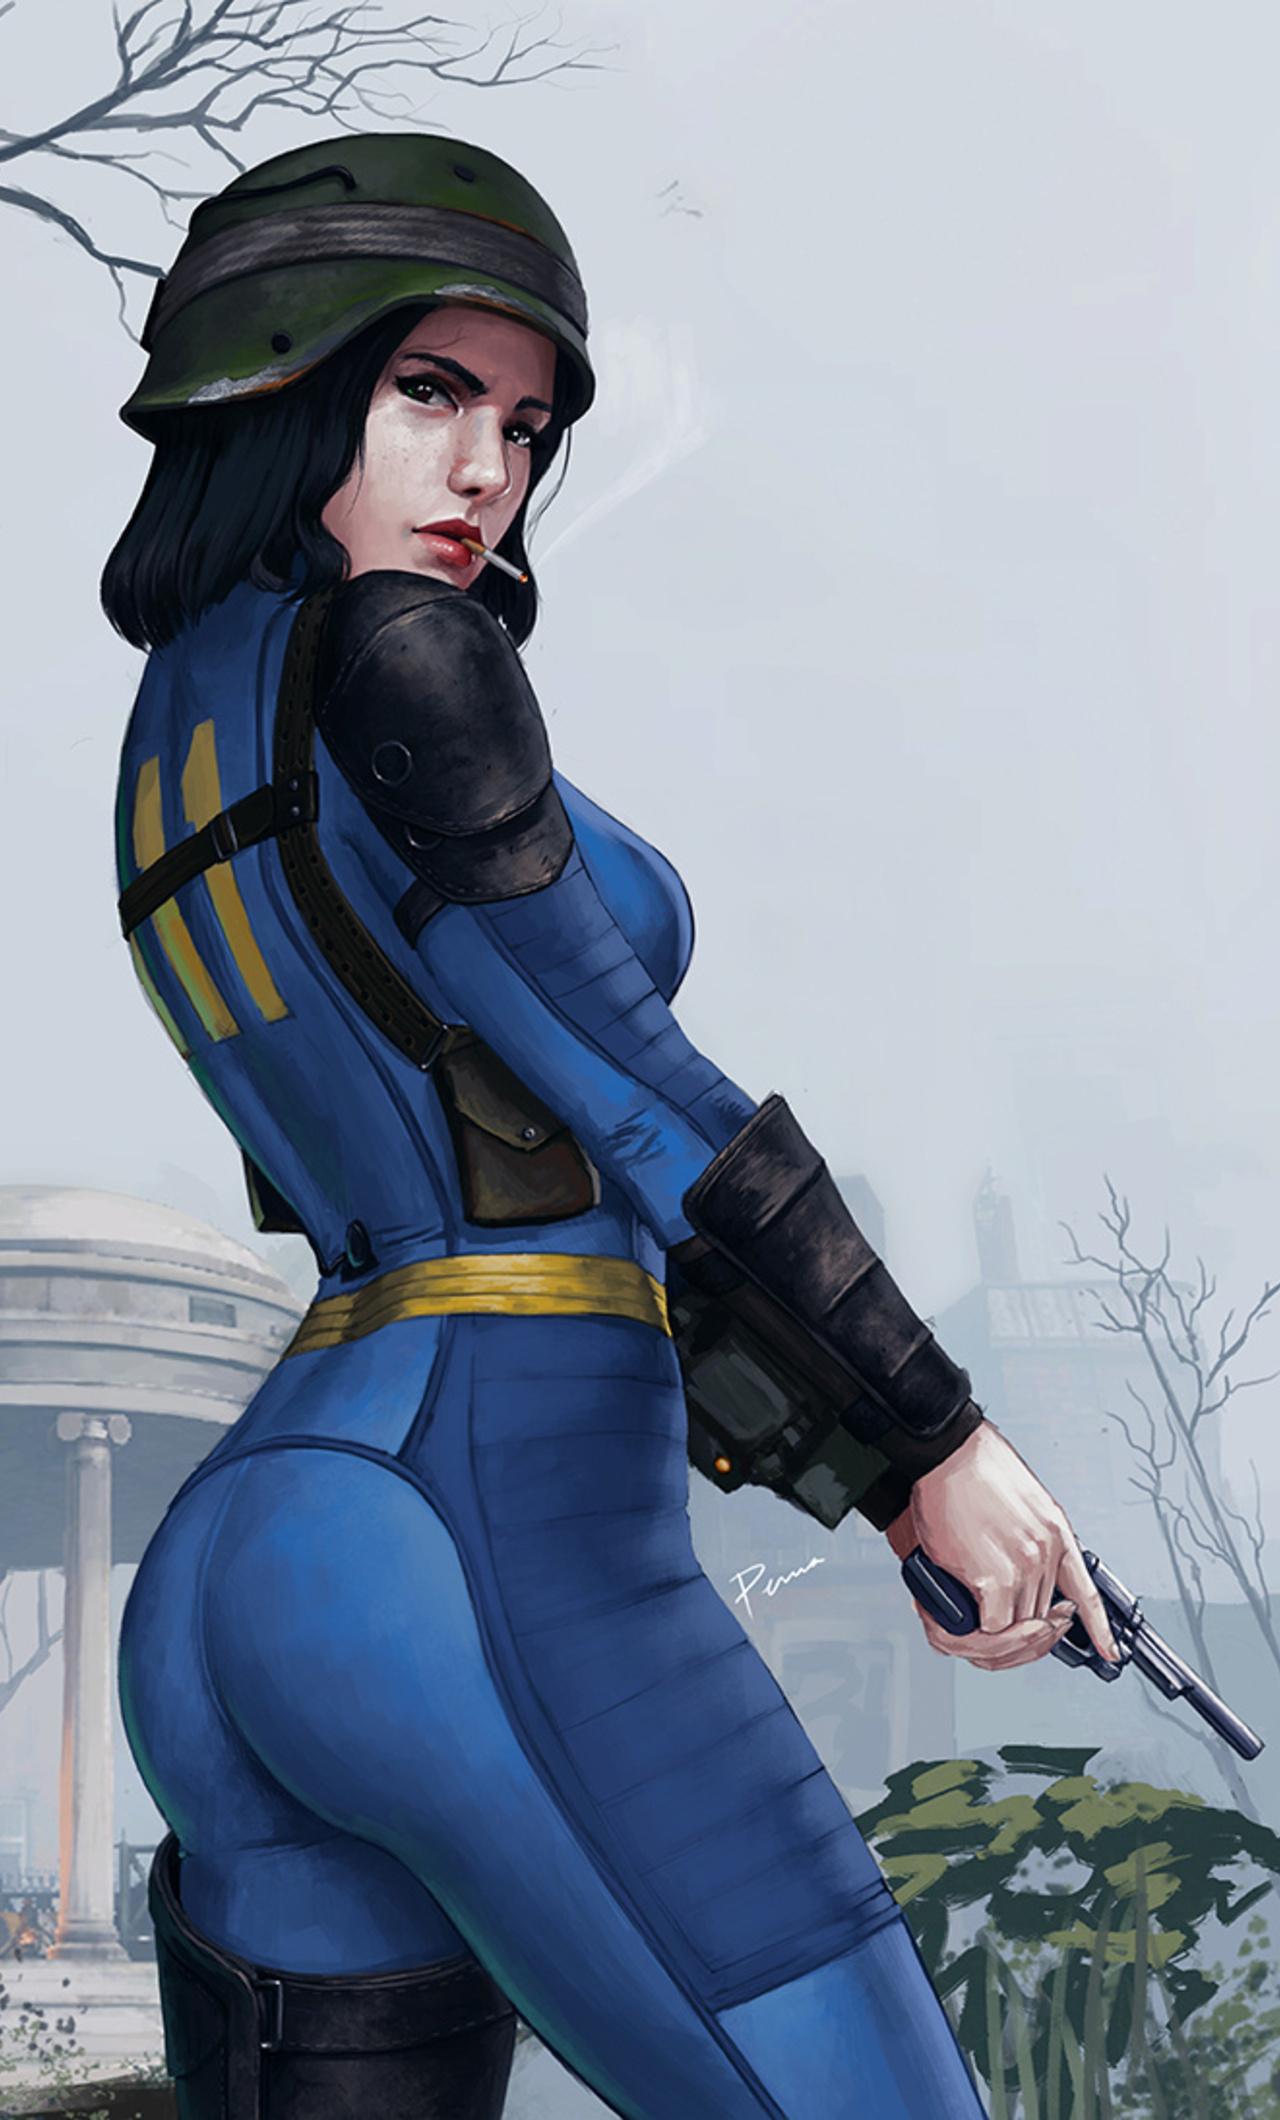 Indian Girl Wallpaper 1080x1920 1280x2120 Sole Survivor Fallout 4 Artwork Iphone 6 Hd 4k